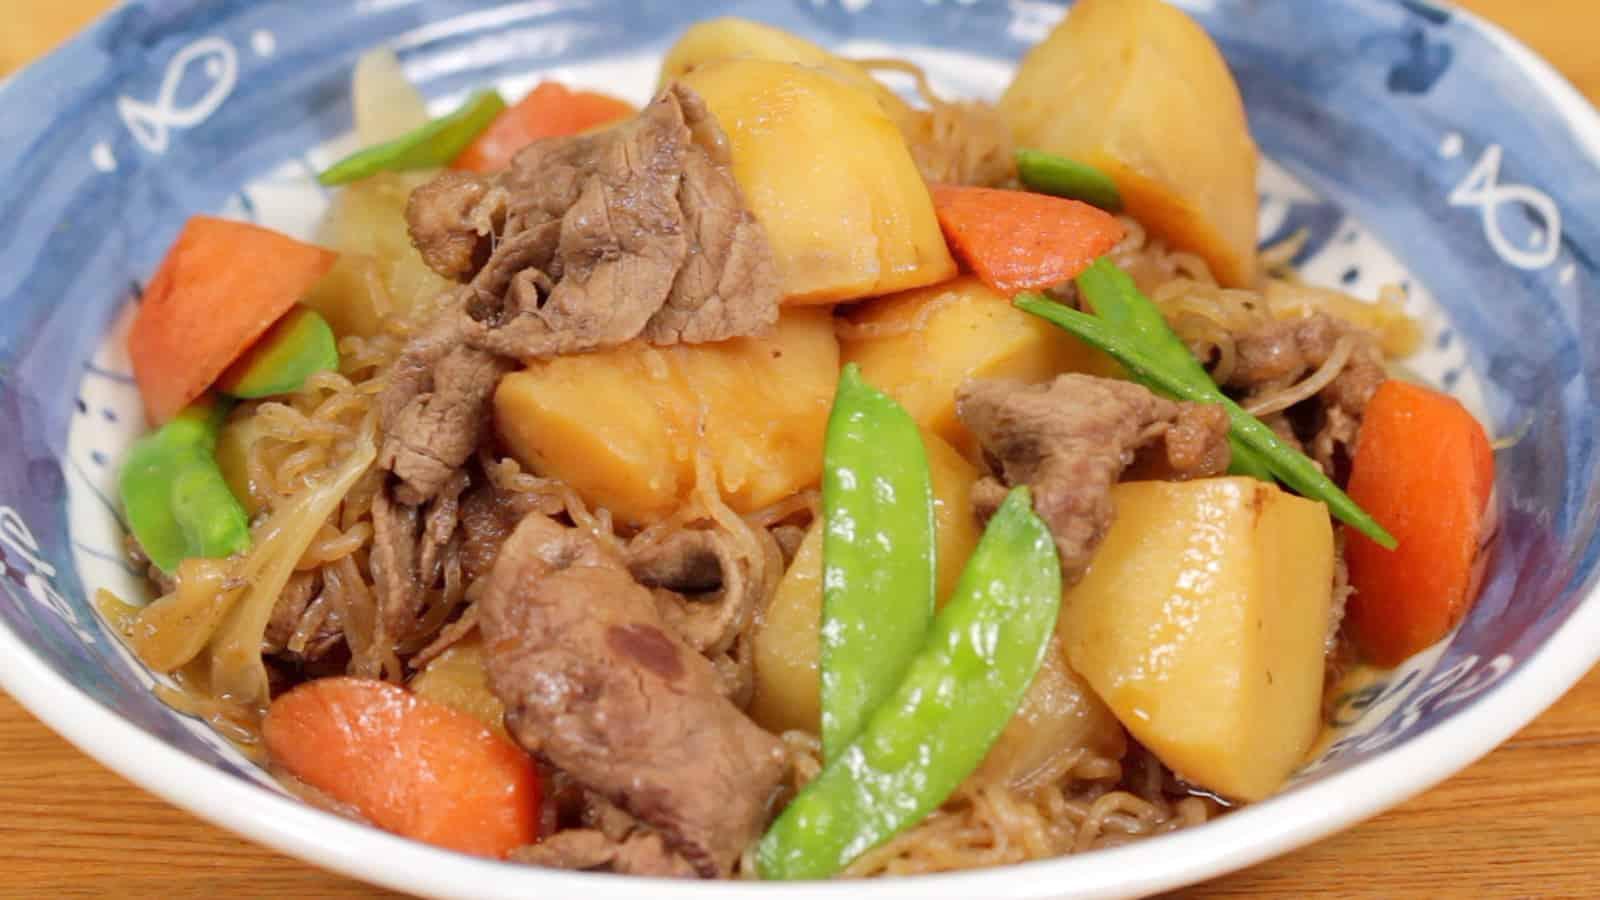 Nikujaga Recipe (Beef and Potatoes Stewed in Savory Soy Sauce Based Dashi Broth)